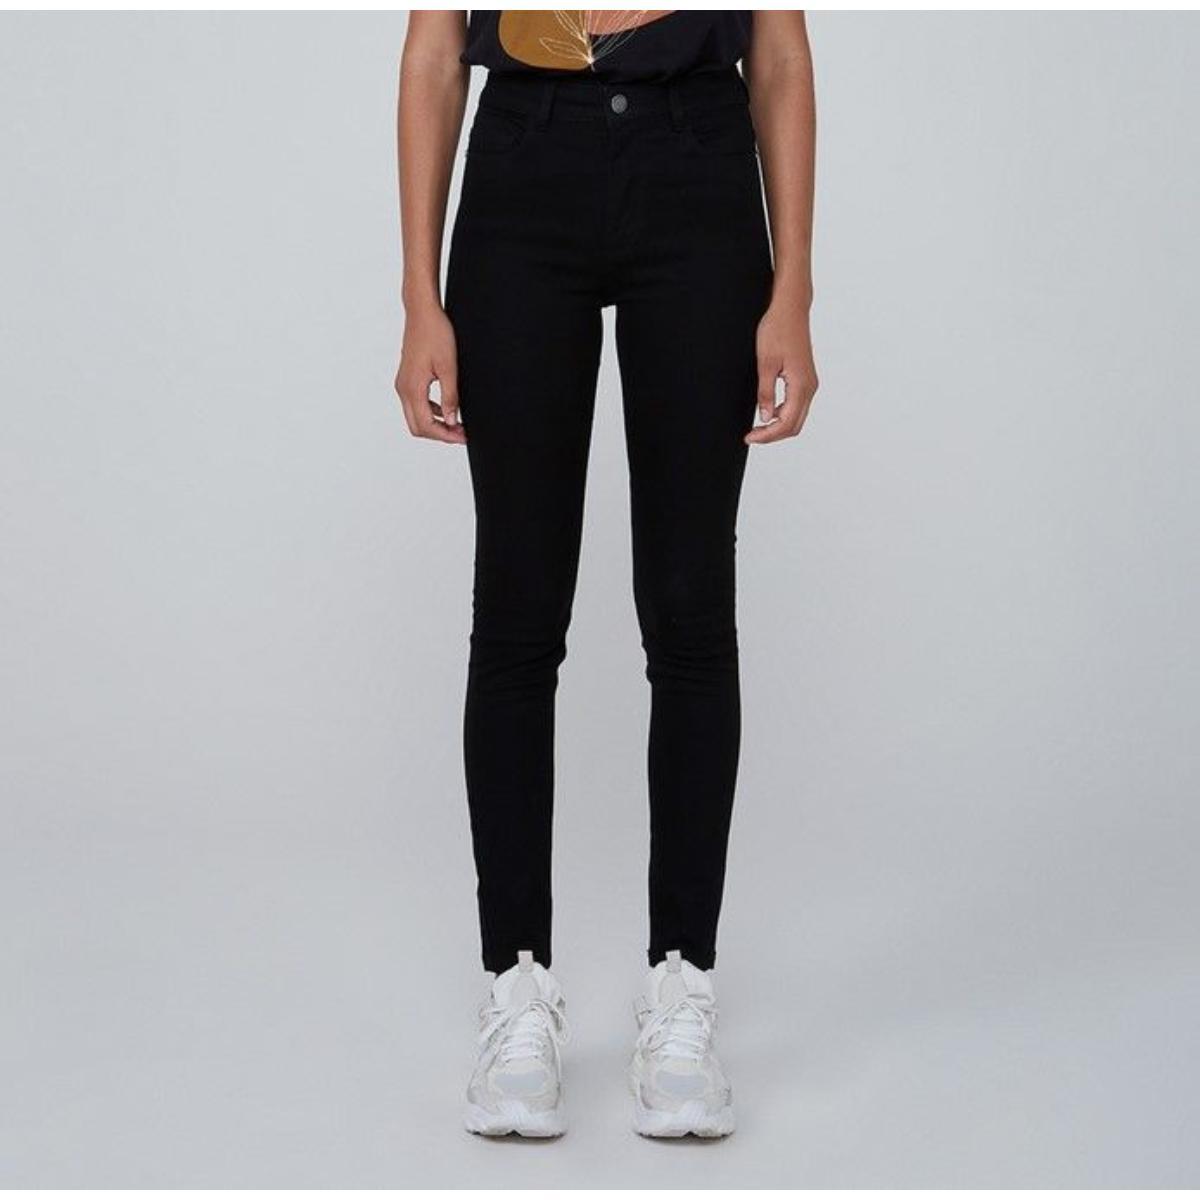 Calça Feminina Dzarm Zmu4 1esi Jeans Escuro